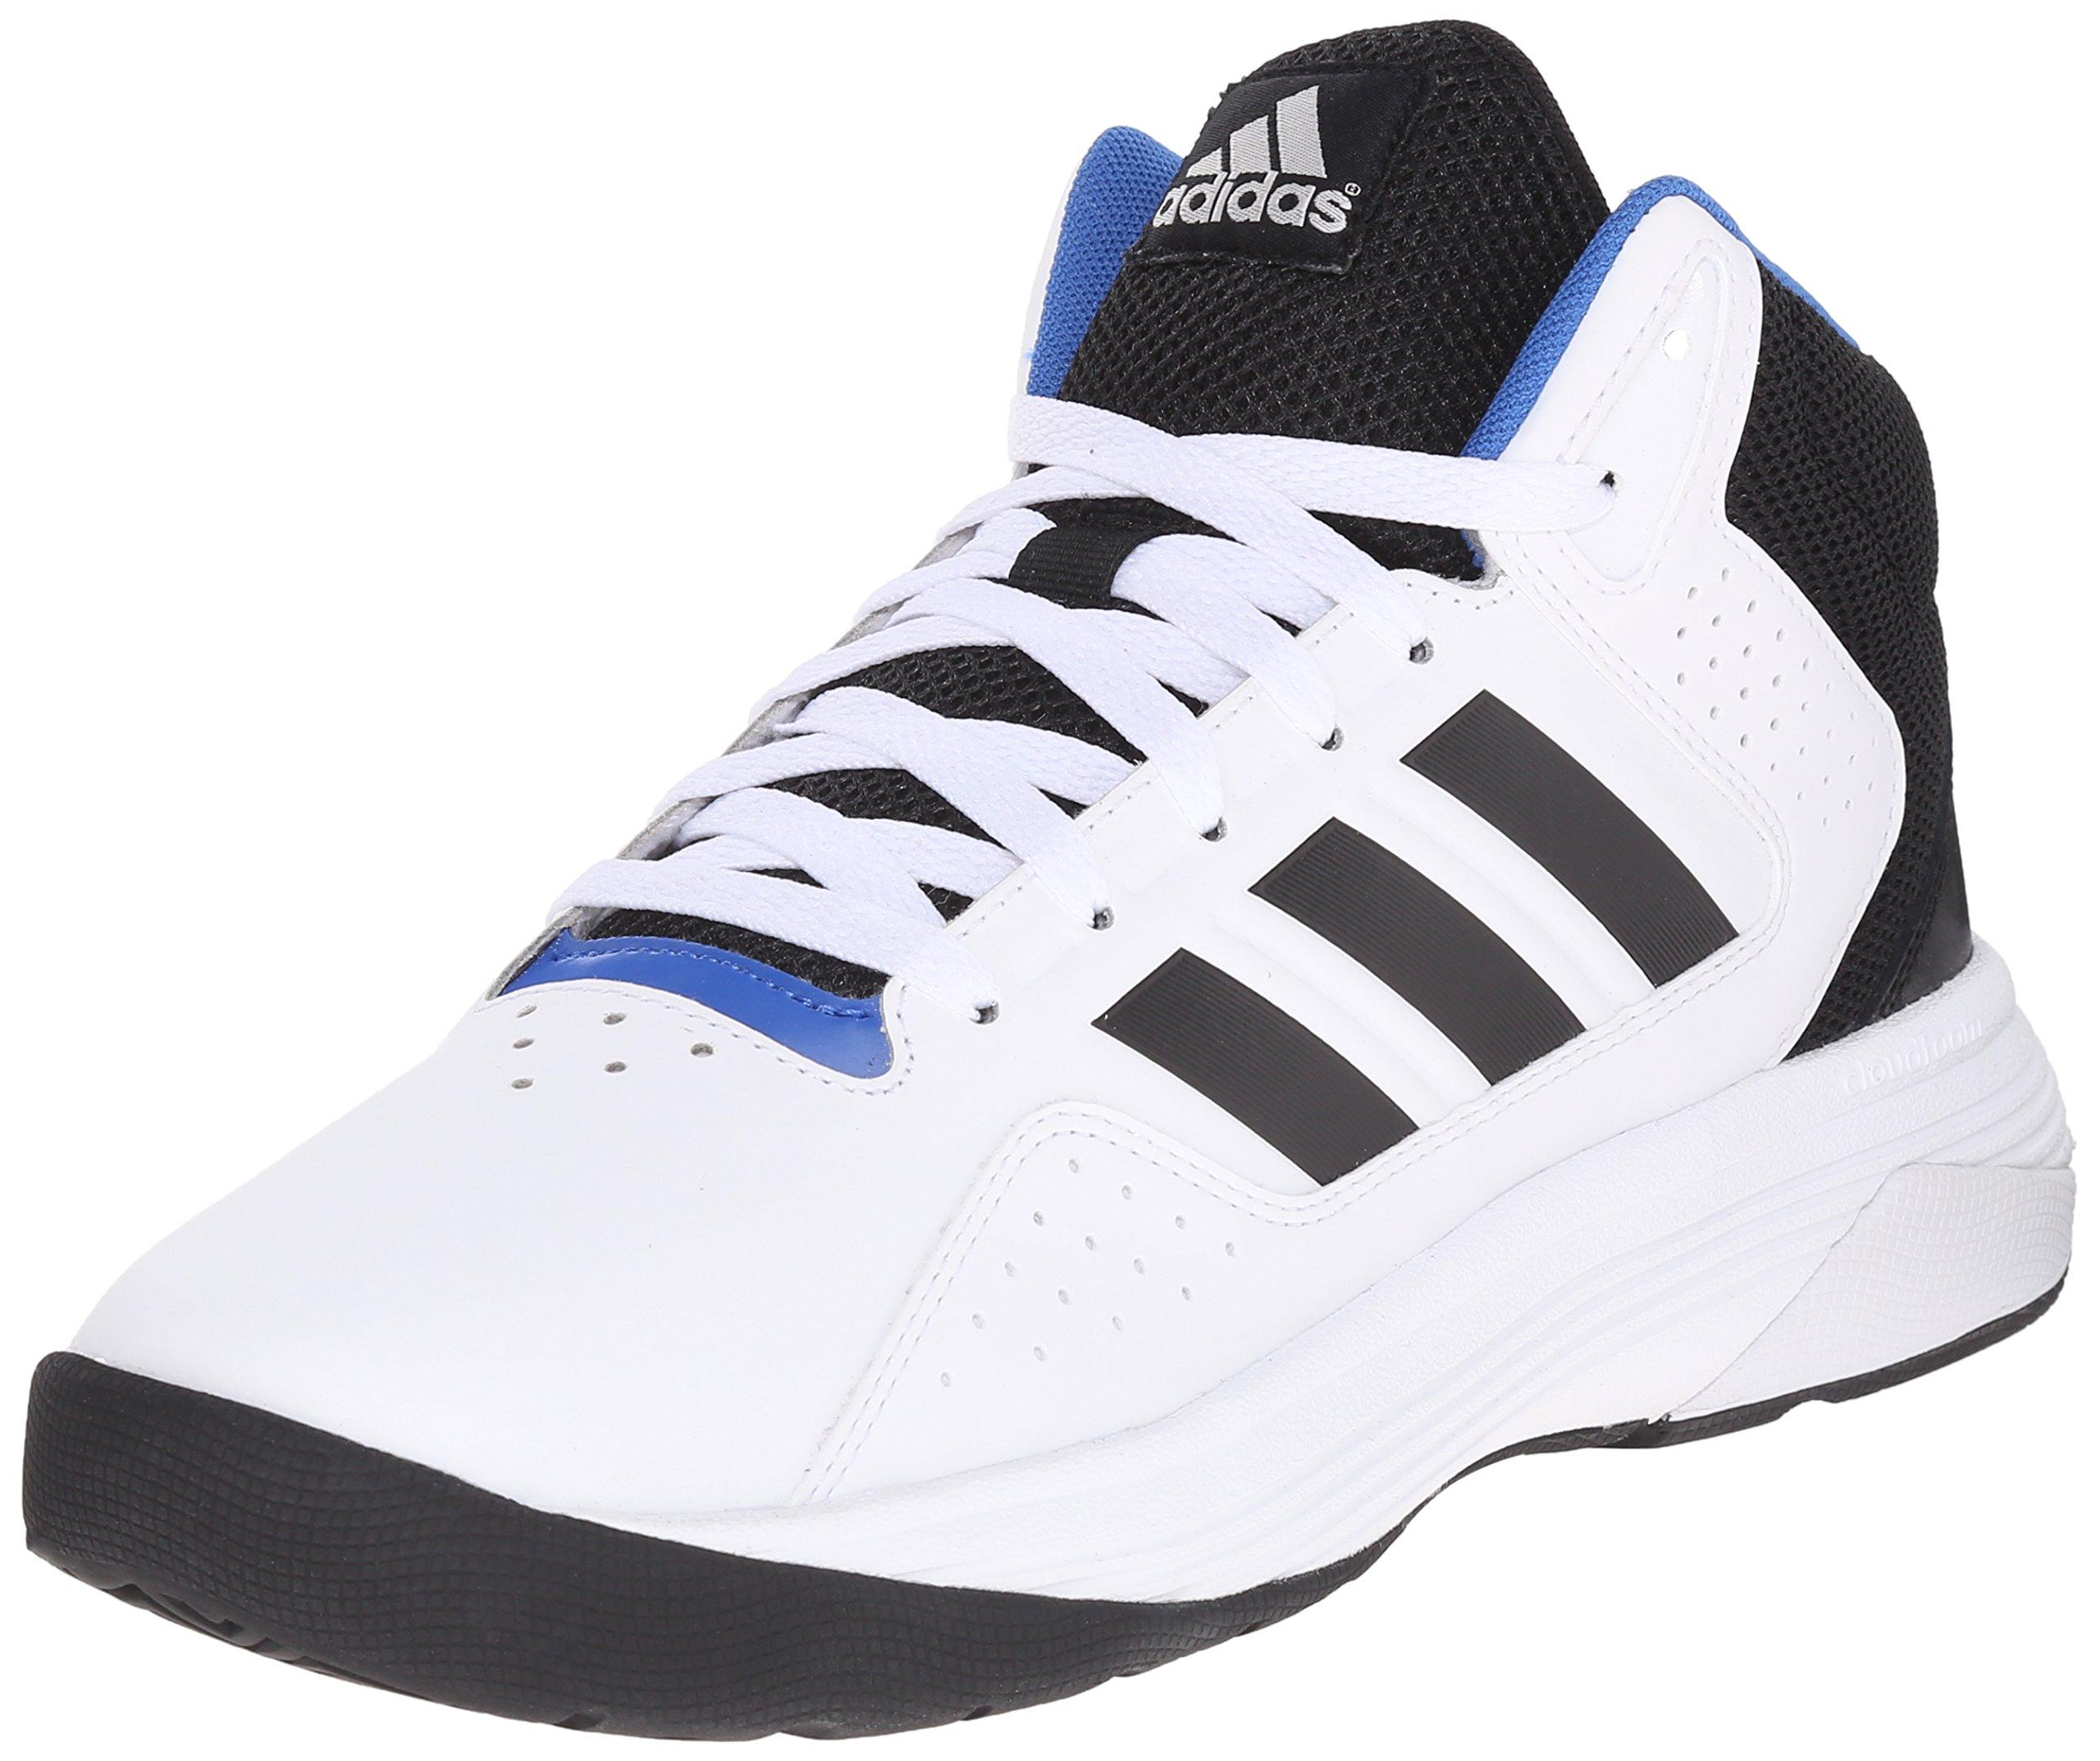 927e4805cec Galleon - Adidas NEO Men s Cloudfoam Ilation Mid Basketball Shoe ...